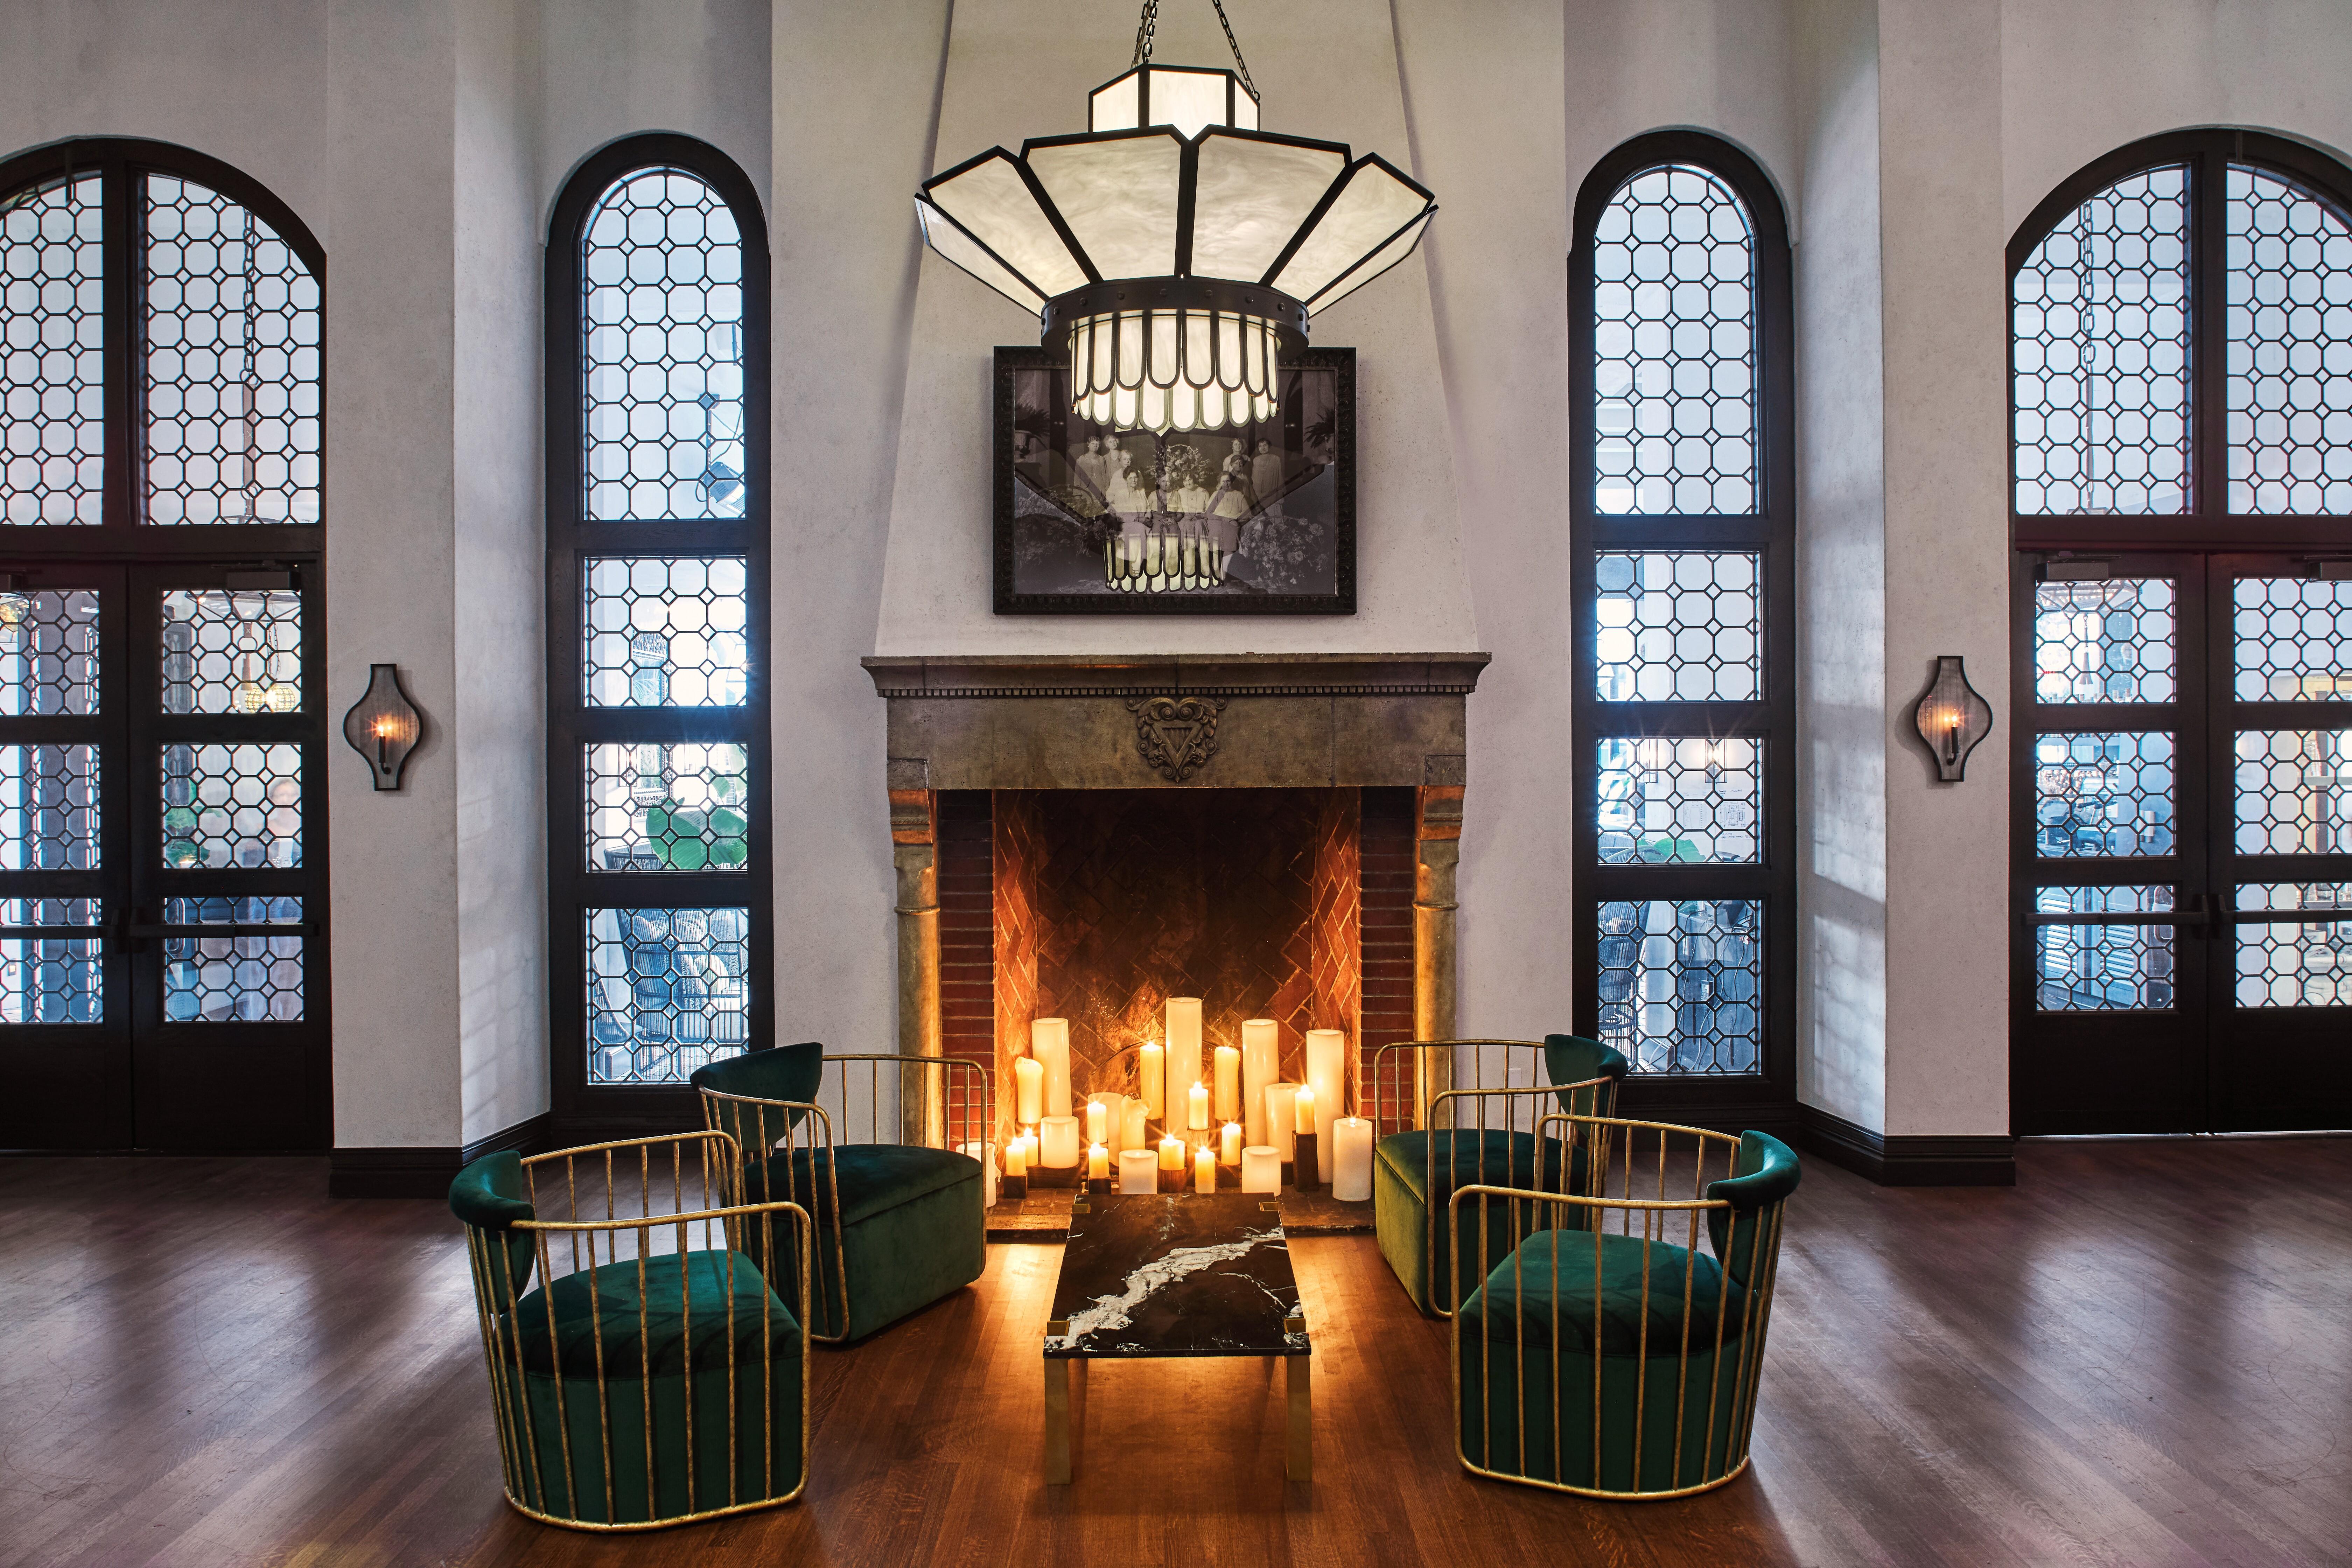 Gran Sala - historic fireplace